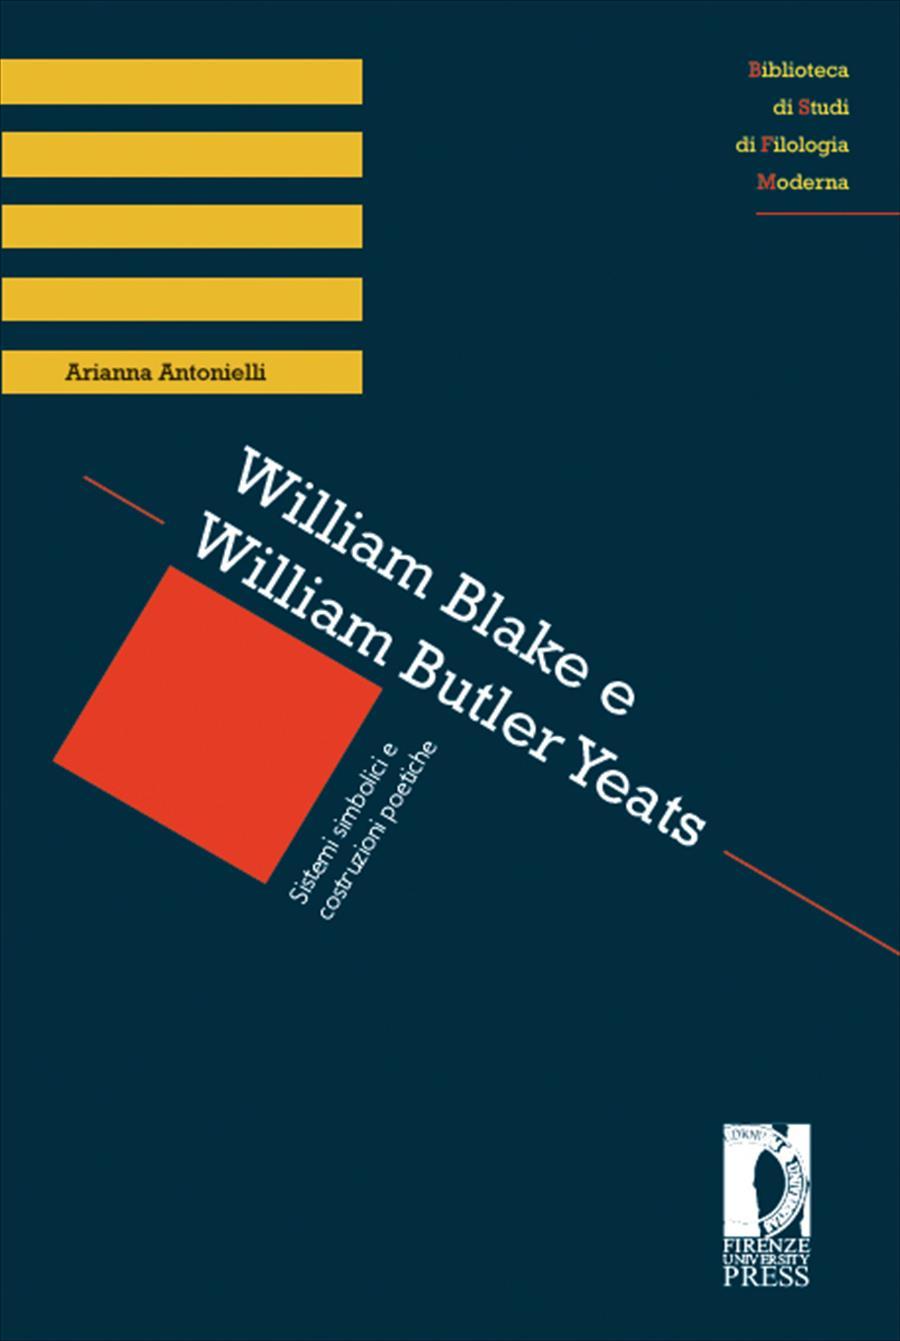 William Blake e William Butler Yeats